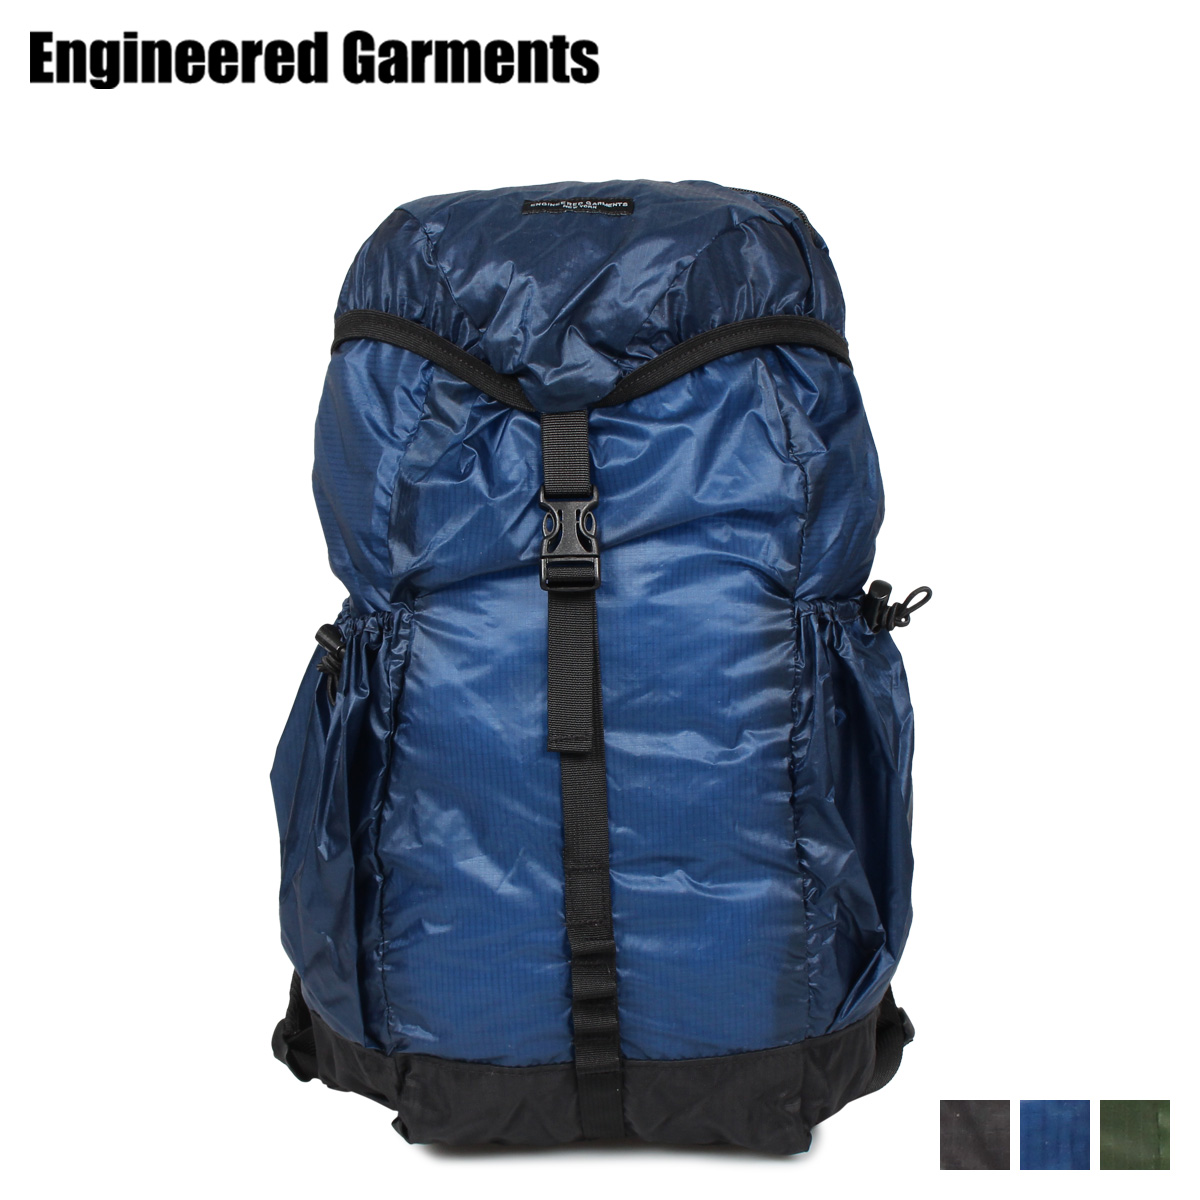 ENGINEERED GARMENTS UL BACKPACK エンジニアドガーメンツ リュック バッグ バックパック メンズ レディース ブラック ネイビー オリーブ 黒 19FH020